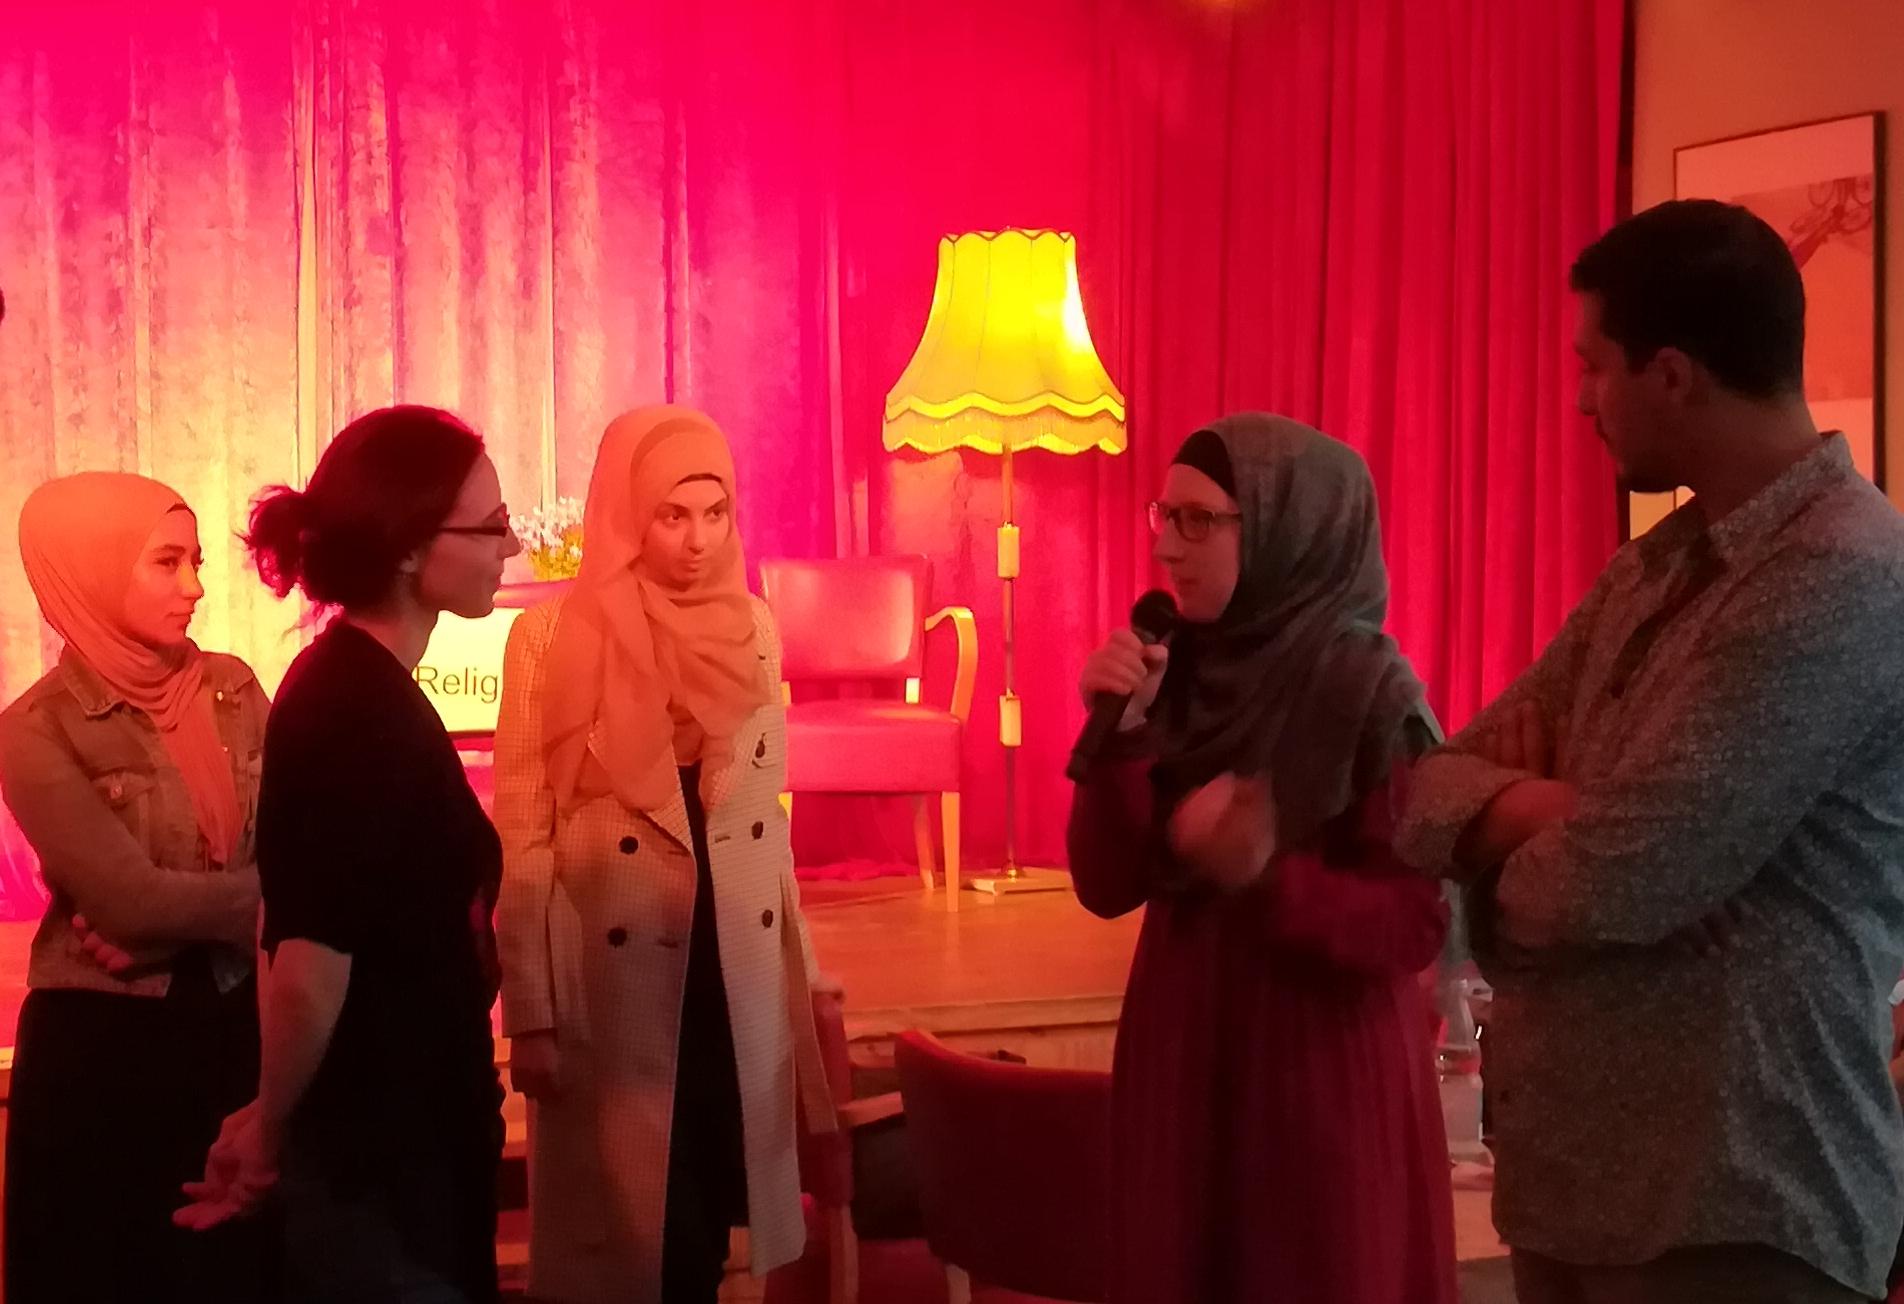 Islam meets LGBTI im Sonntags-Club